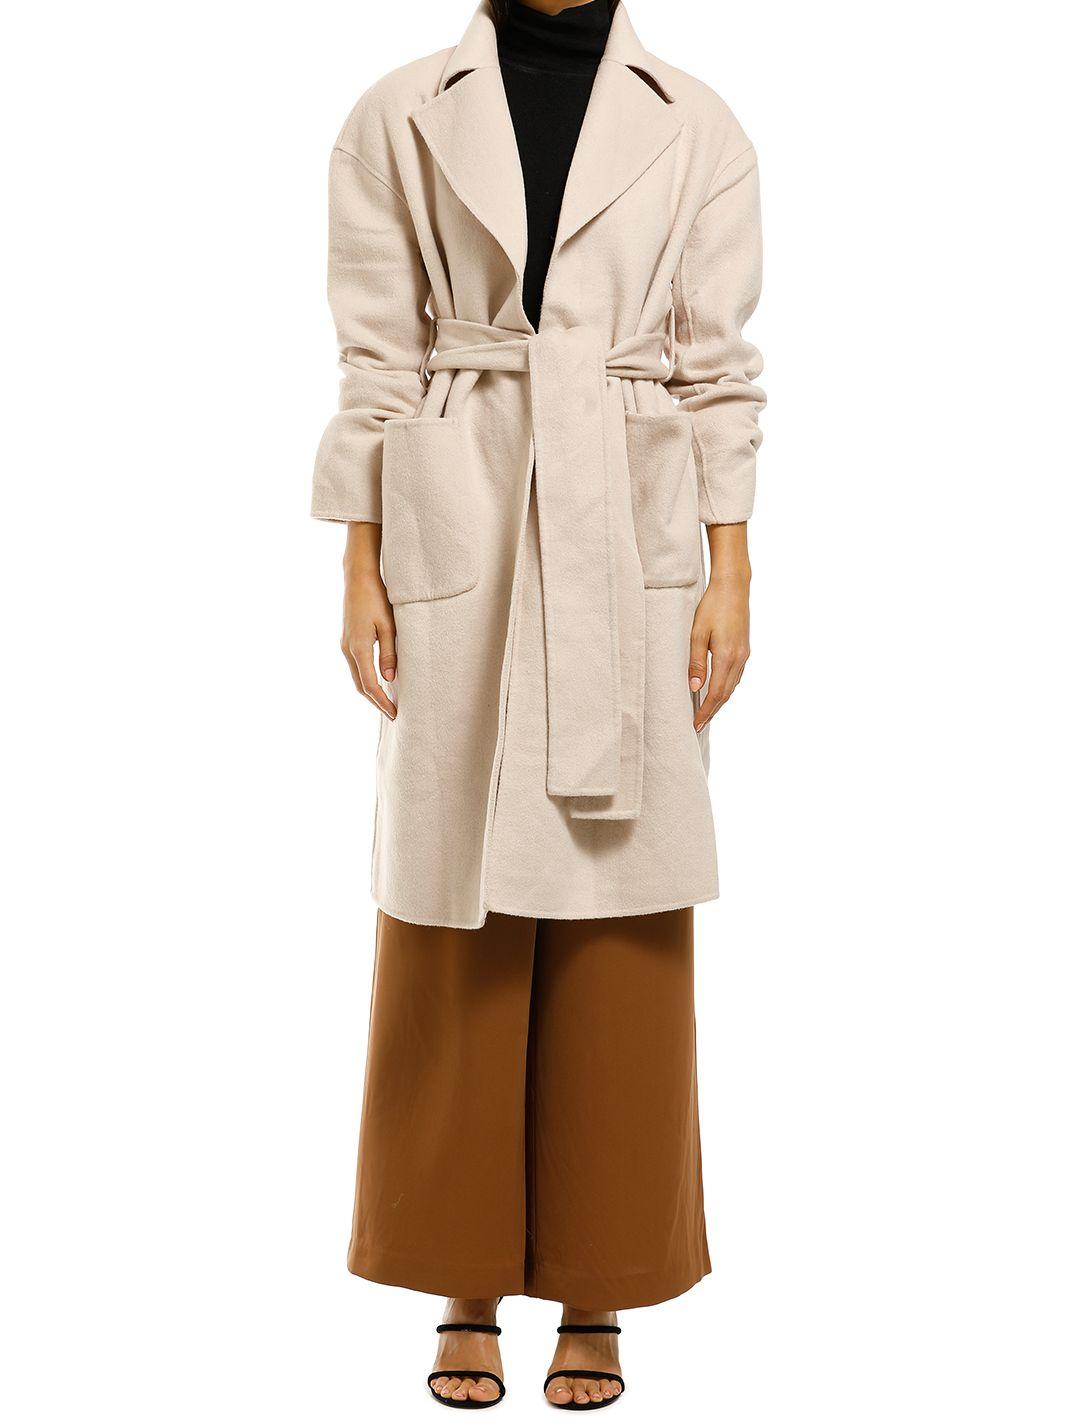 Misha-Collection-Haillie-Coat-Beige-Front